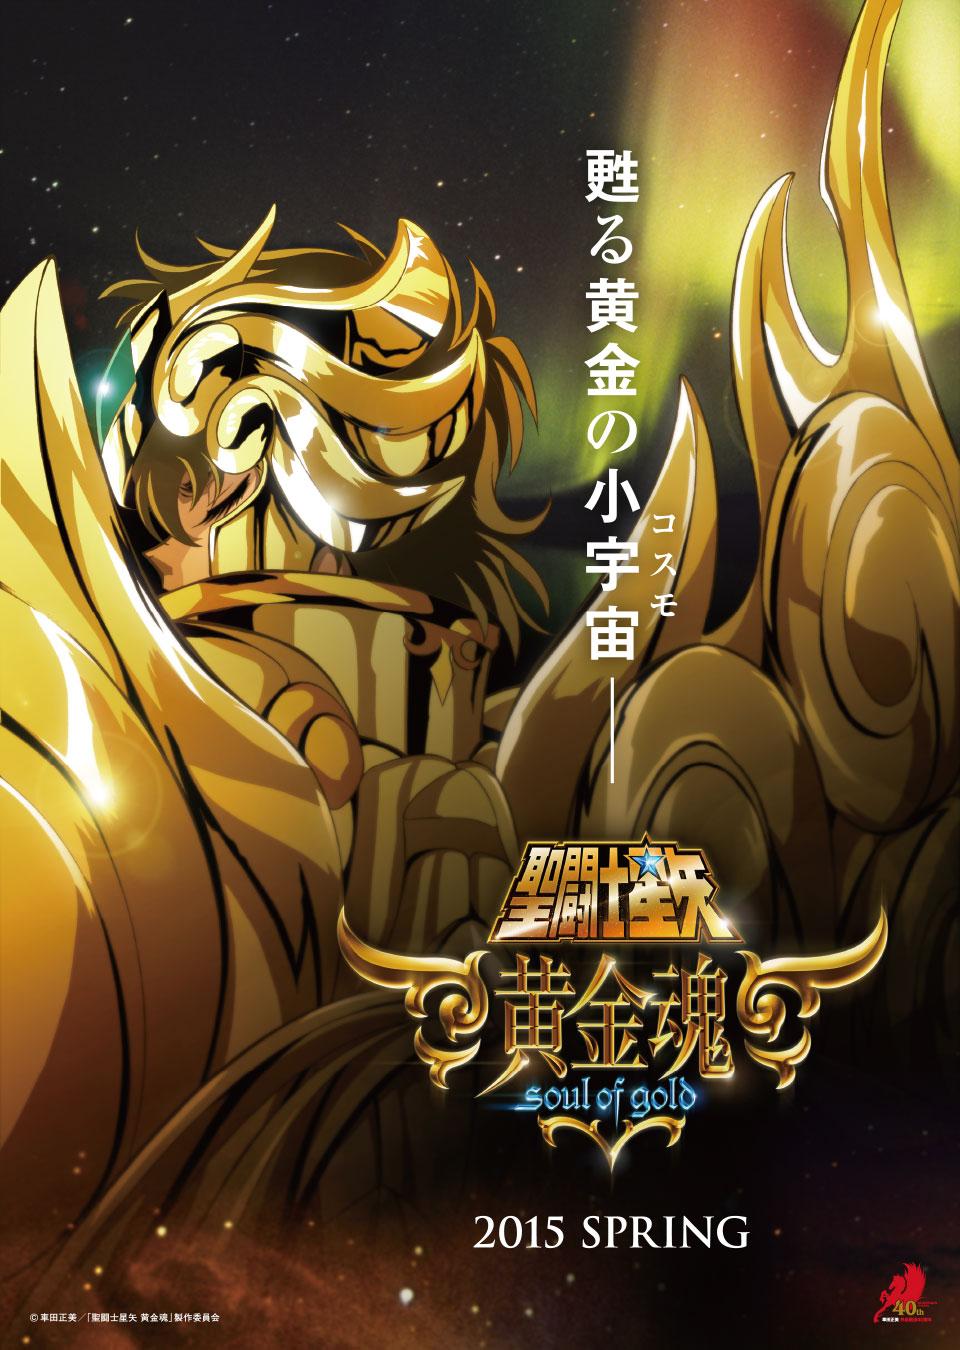 Saint Seiya – Soul of Gold sera une série TV